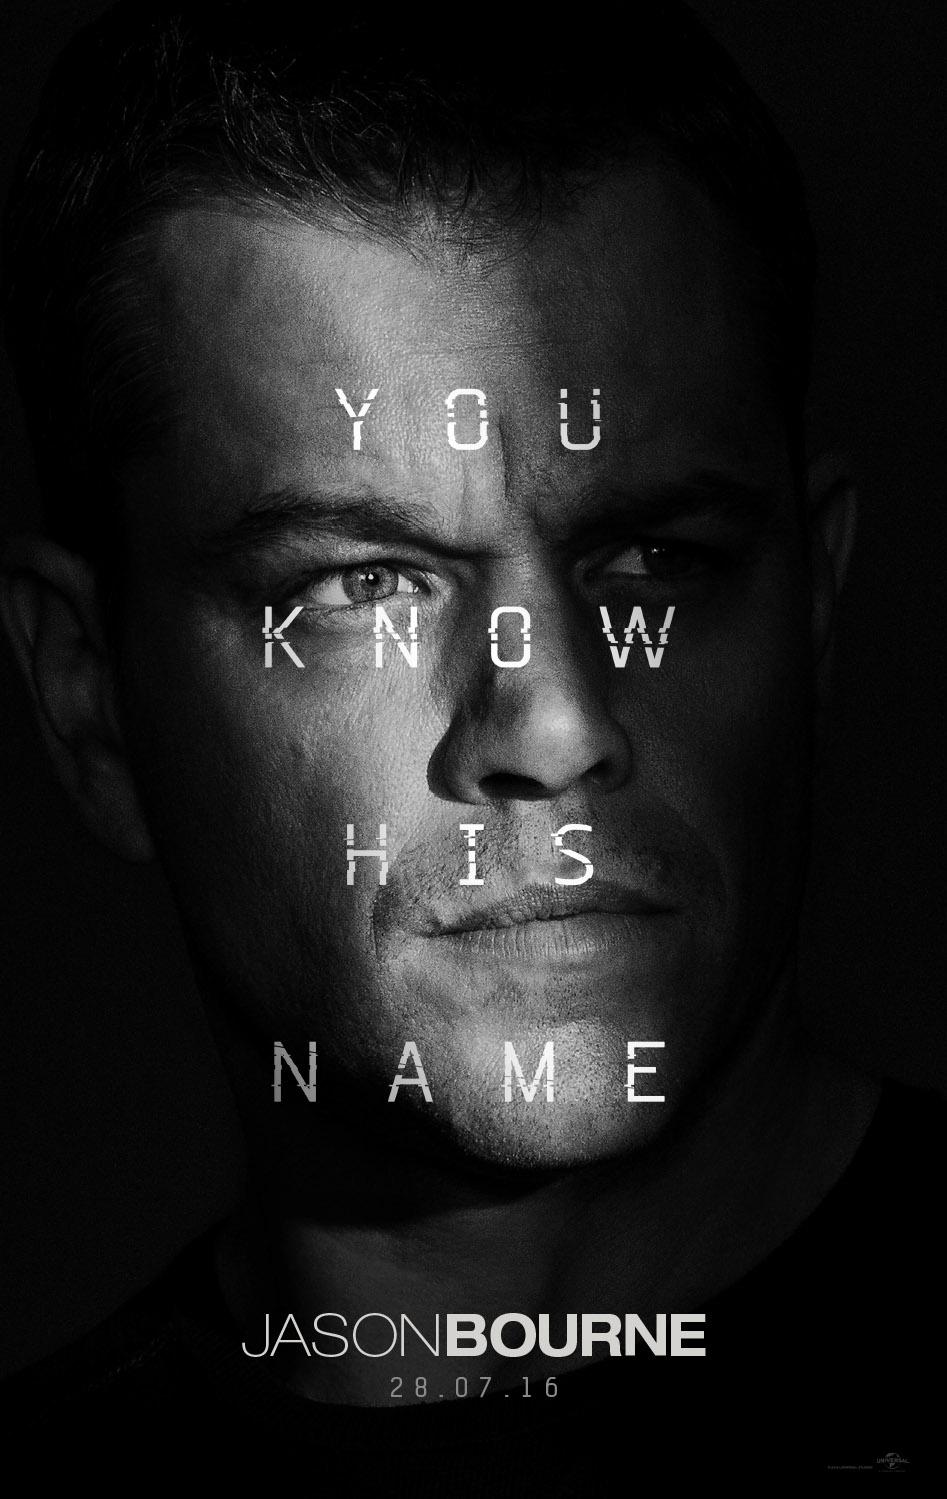 Jason Bourne poster, © 2016 Universal Pictures International